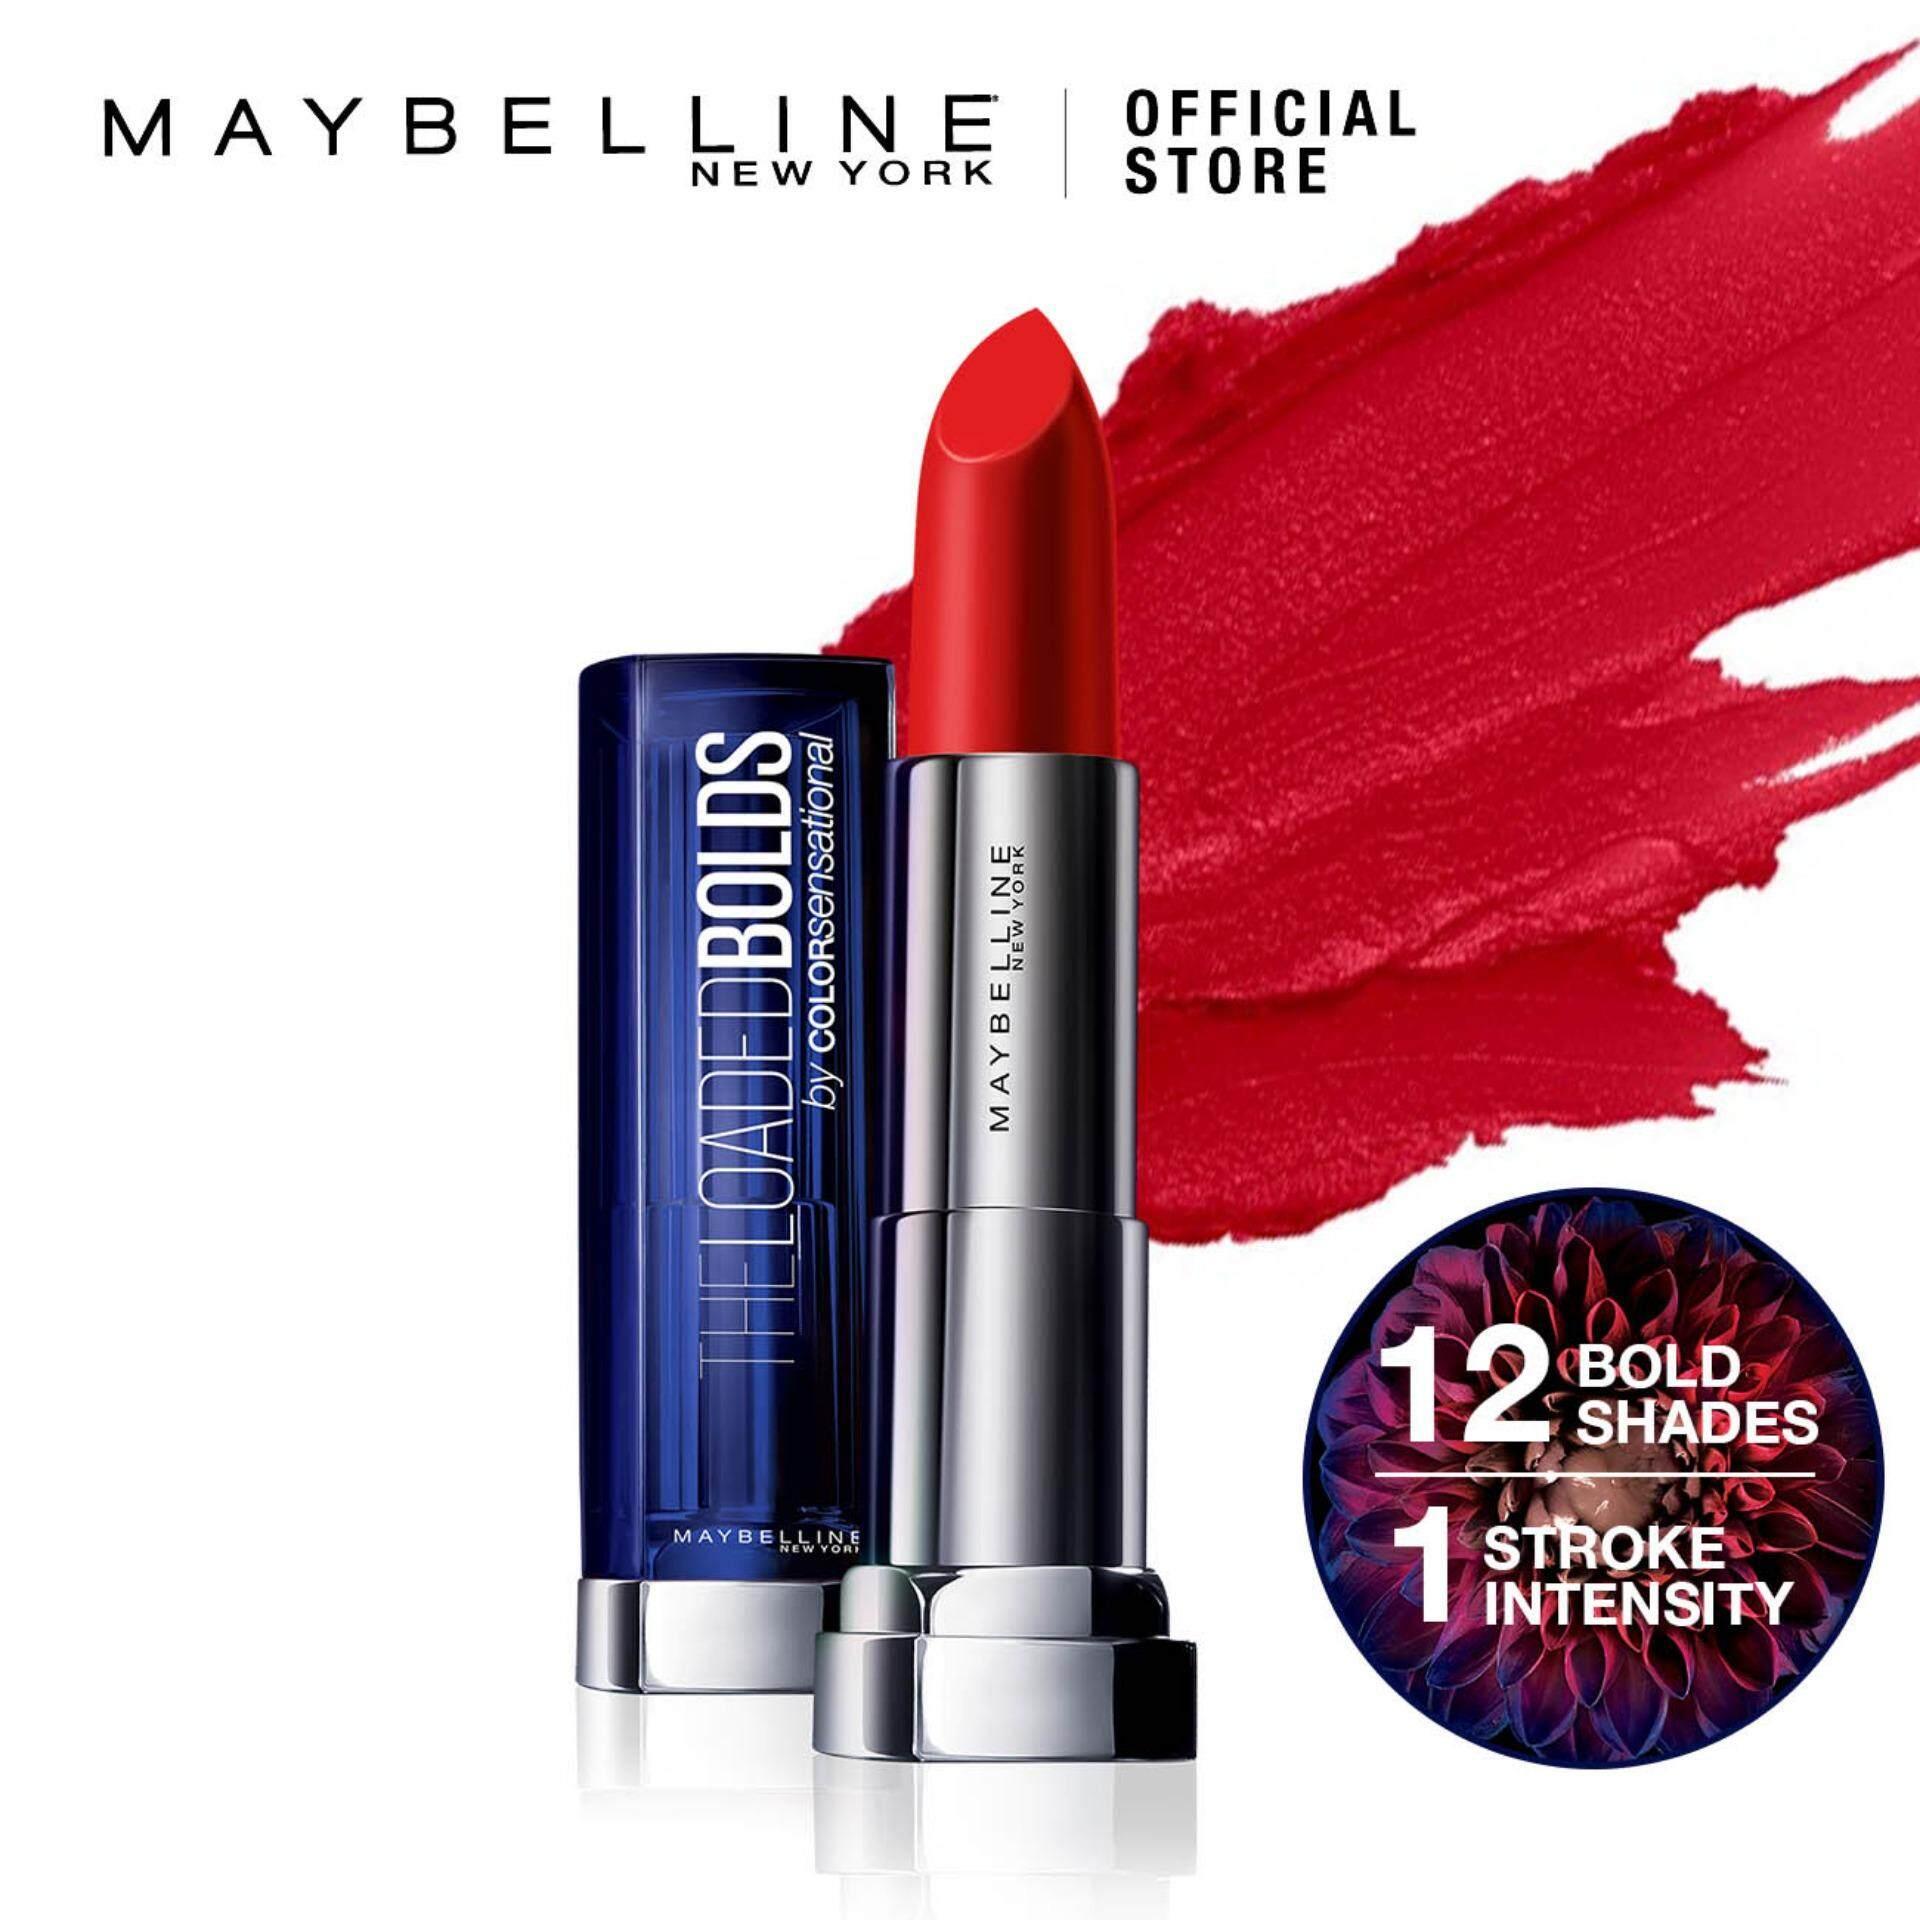 Fitur Maybelline Color Show Blush Dan Harga Terbaru Info On Sensational The Loaded Bolds Lipstick